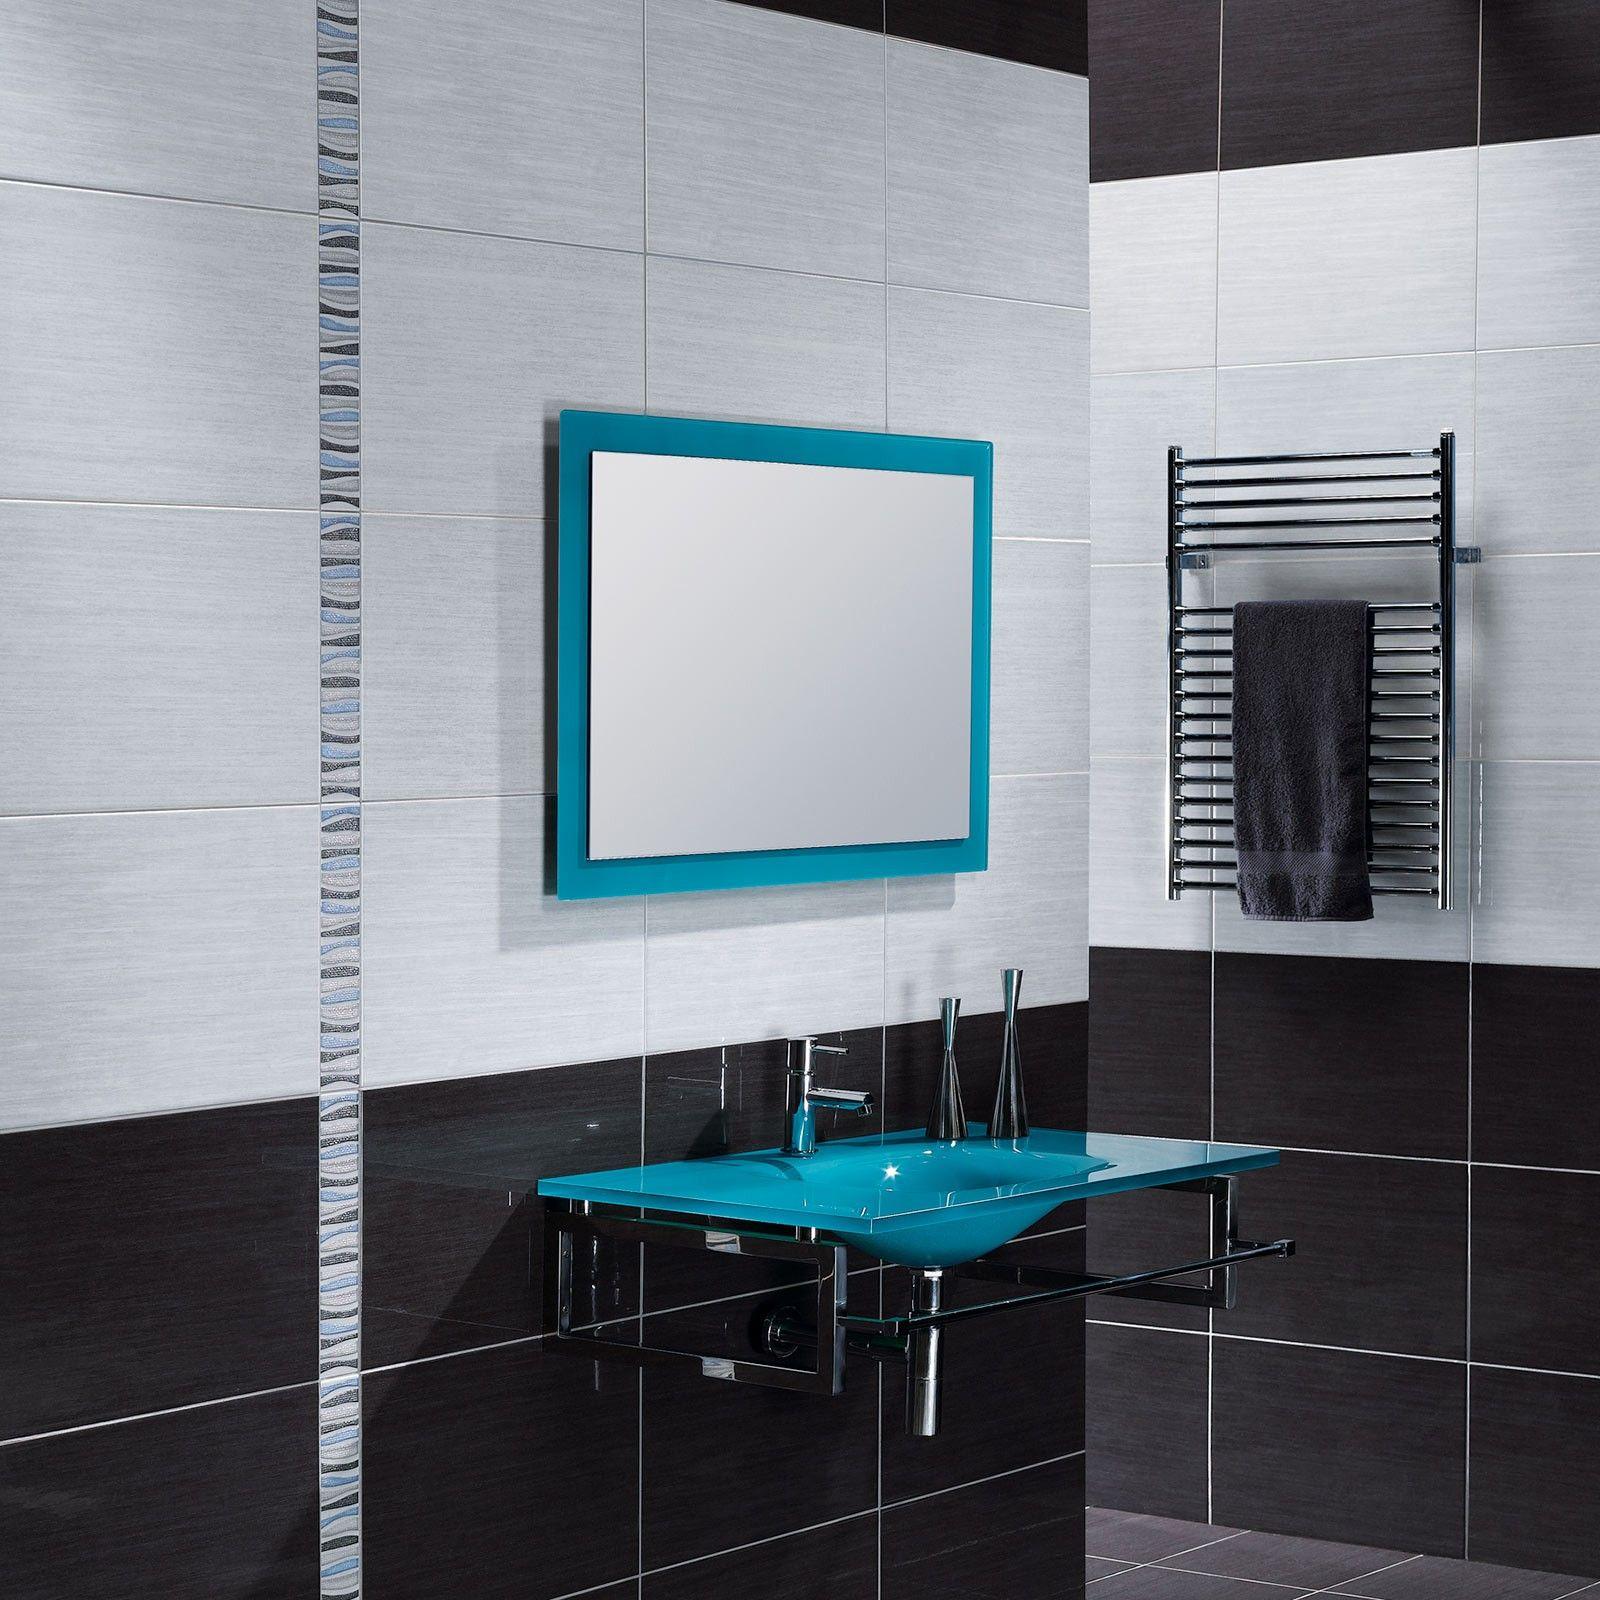 forum branco ceramic wall tile black and white bathroom. Black Bedroom Furniture Sets. Home Design Ideas